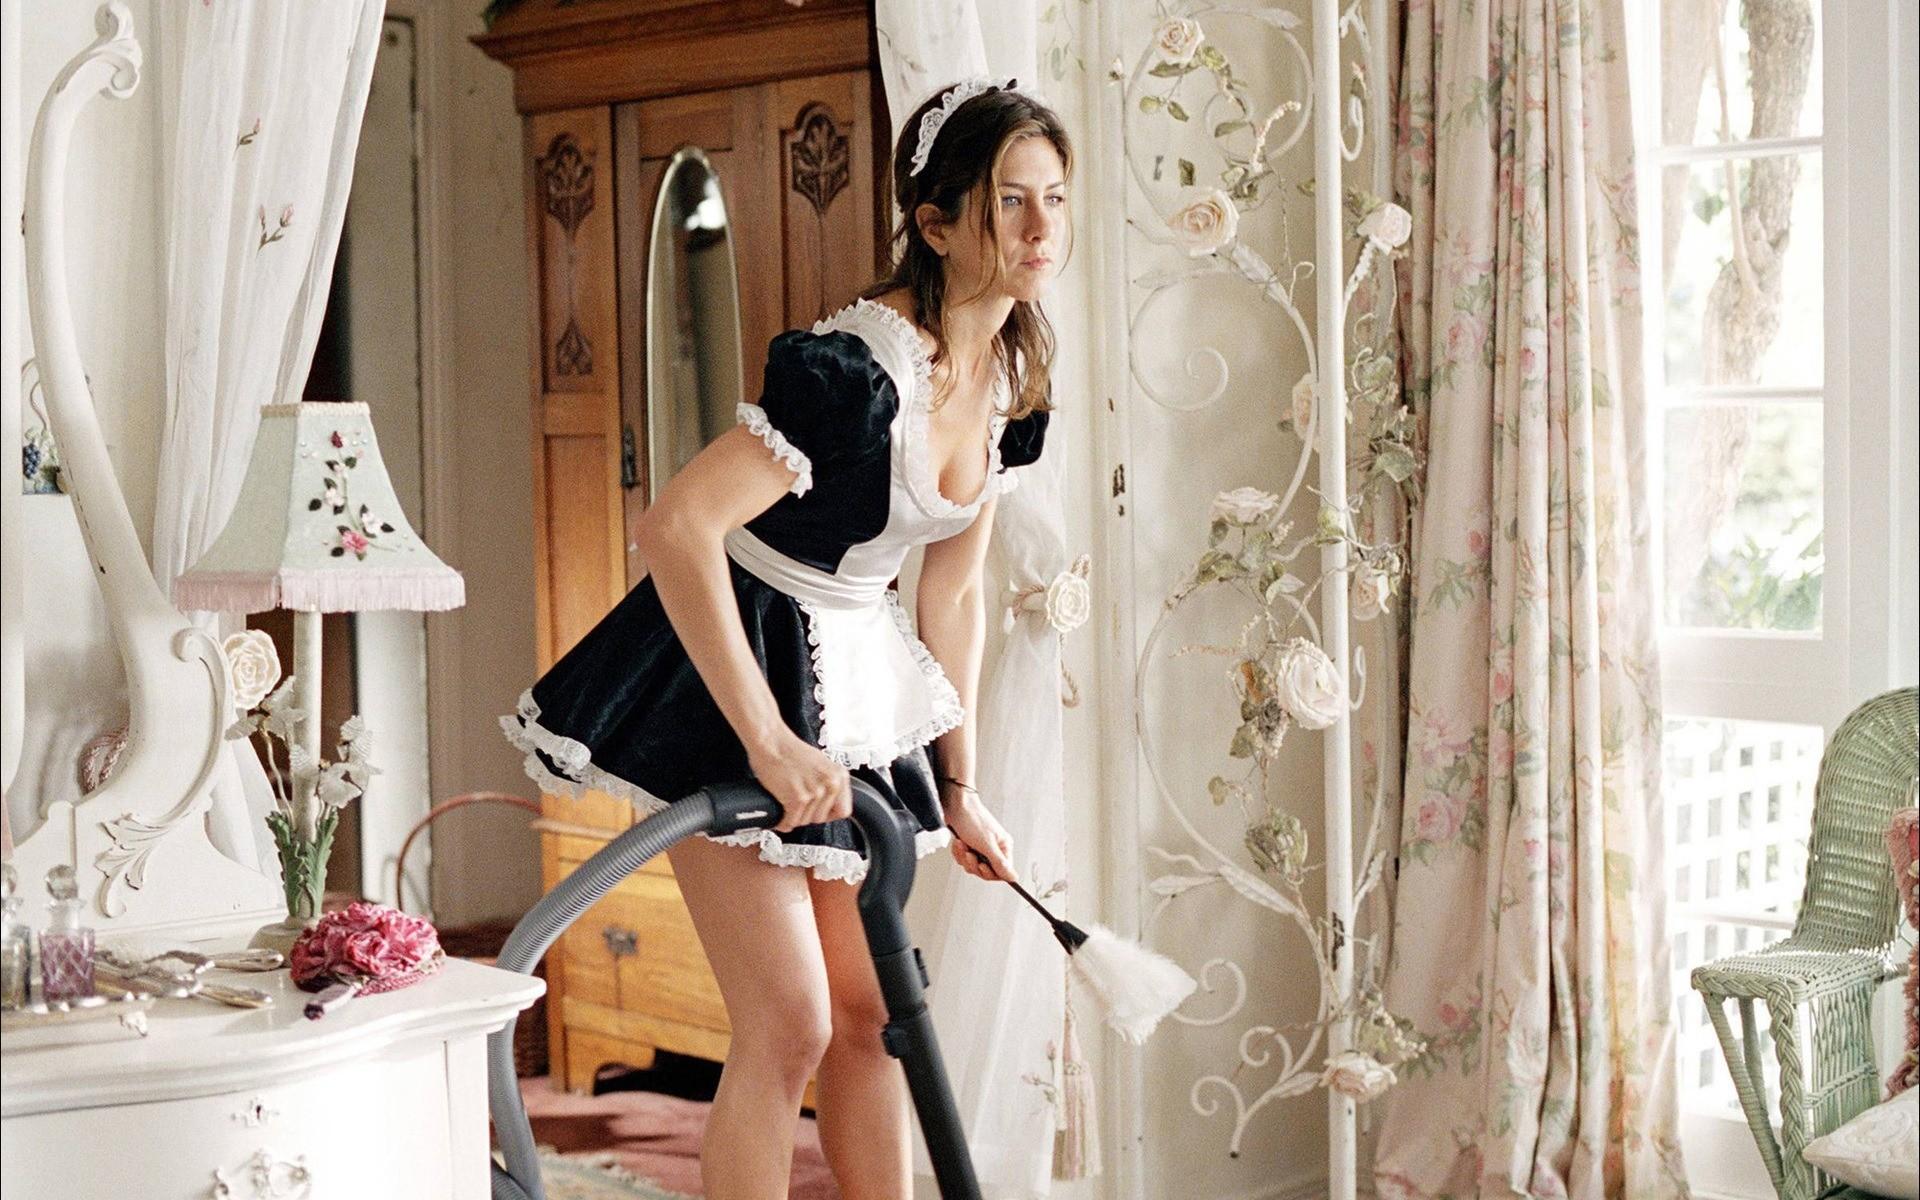 Тест: насколько ты помешана на чистоте и порядке дома?